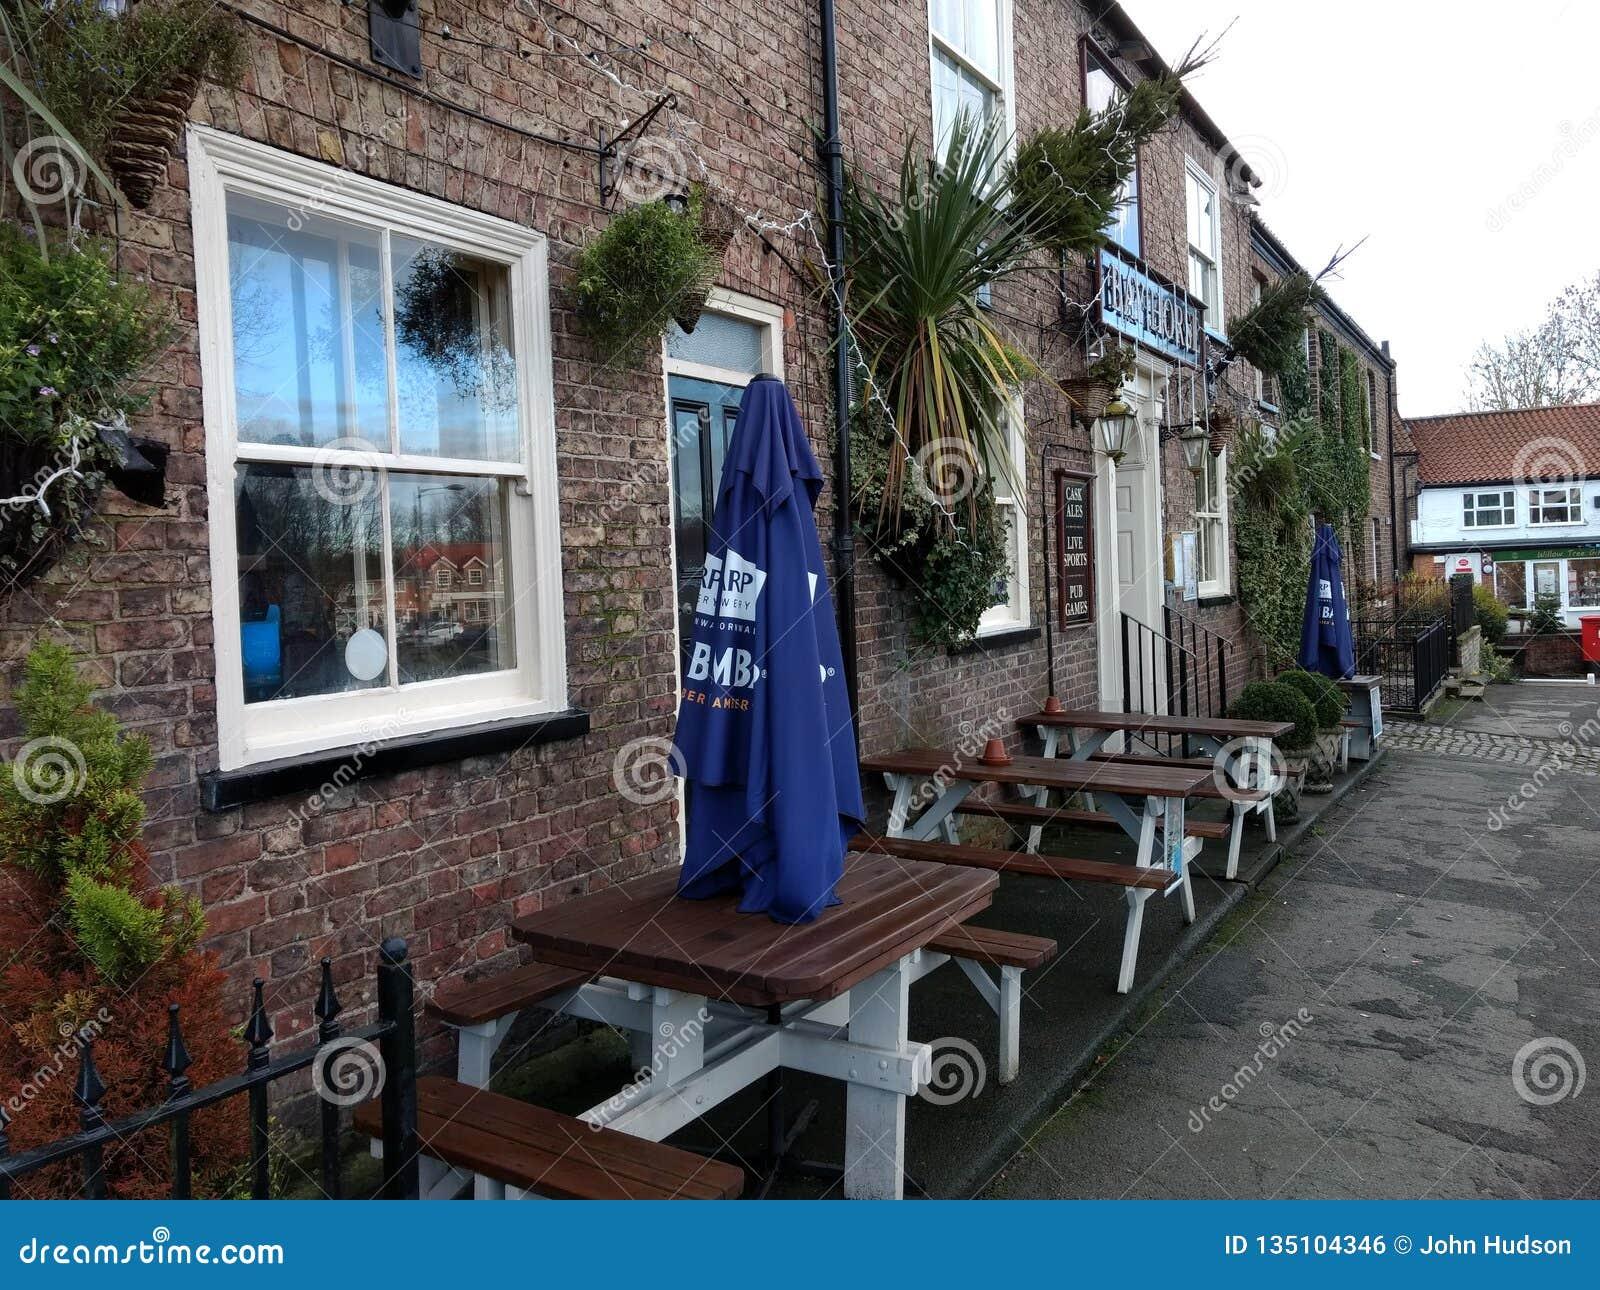 Stamford Bridge main street with pub.